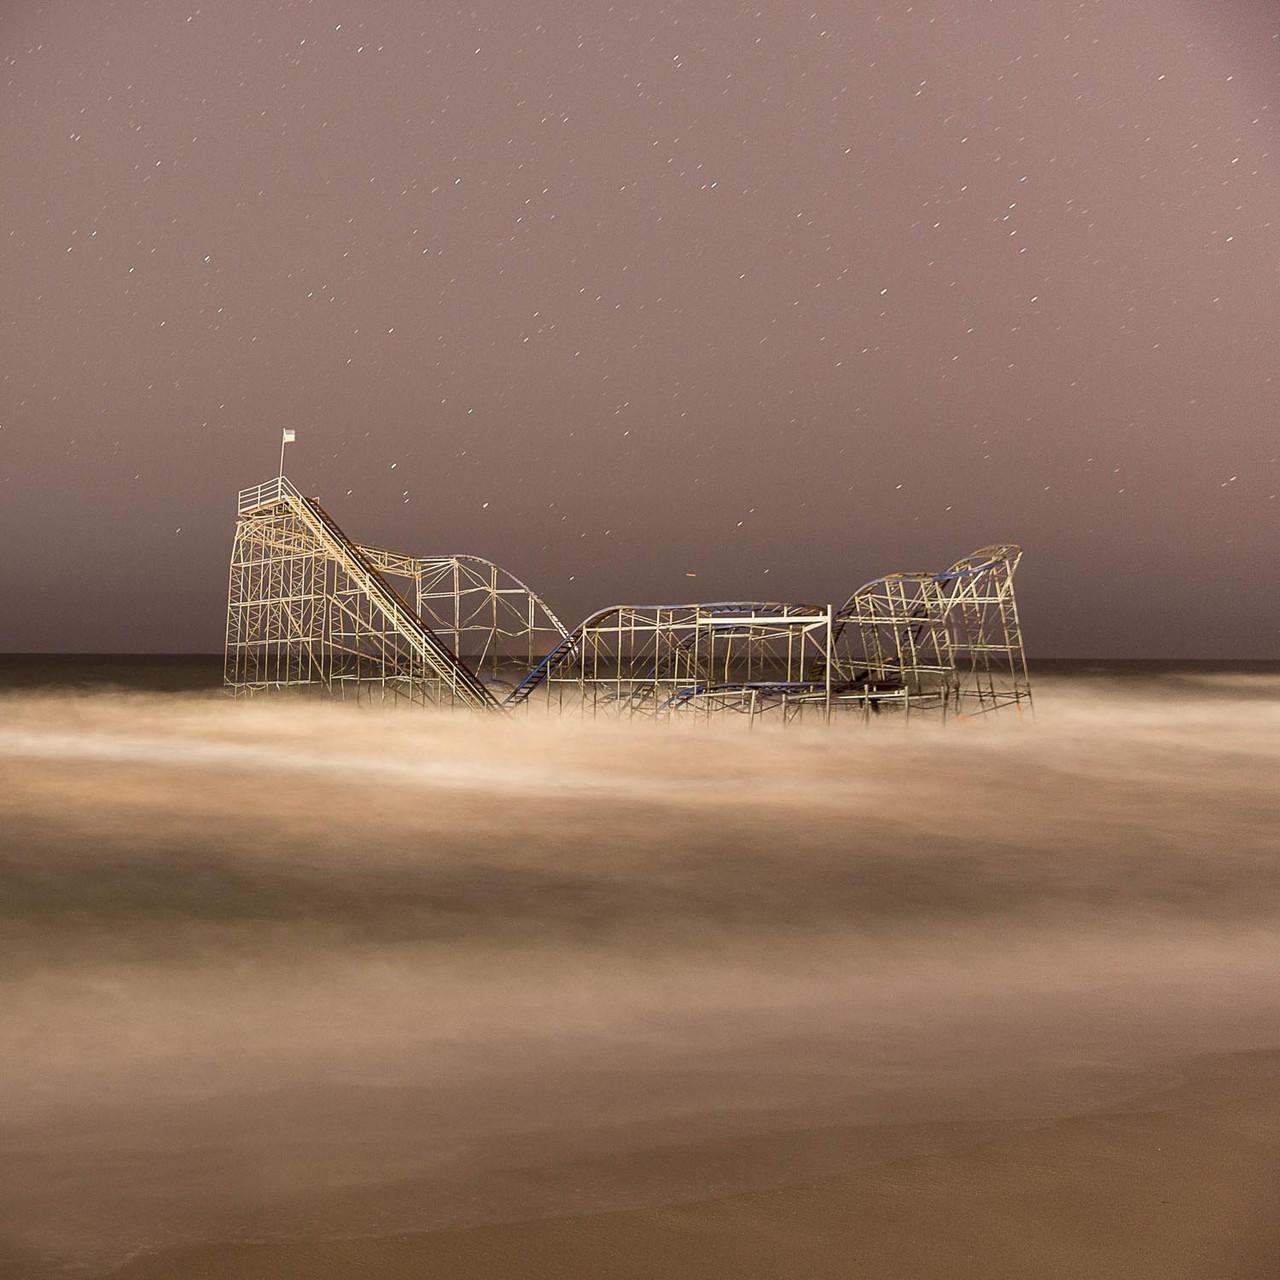 Ocean Roller Coaster , 2013 C Print 15 x 15 in.